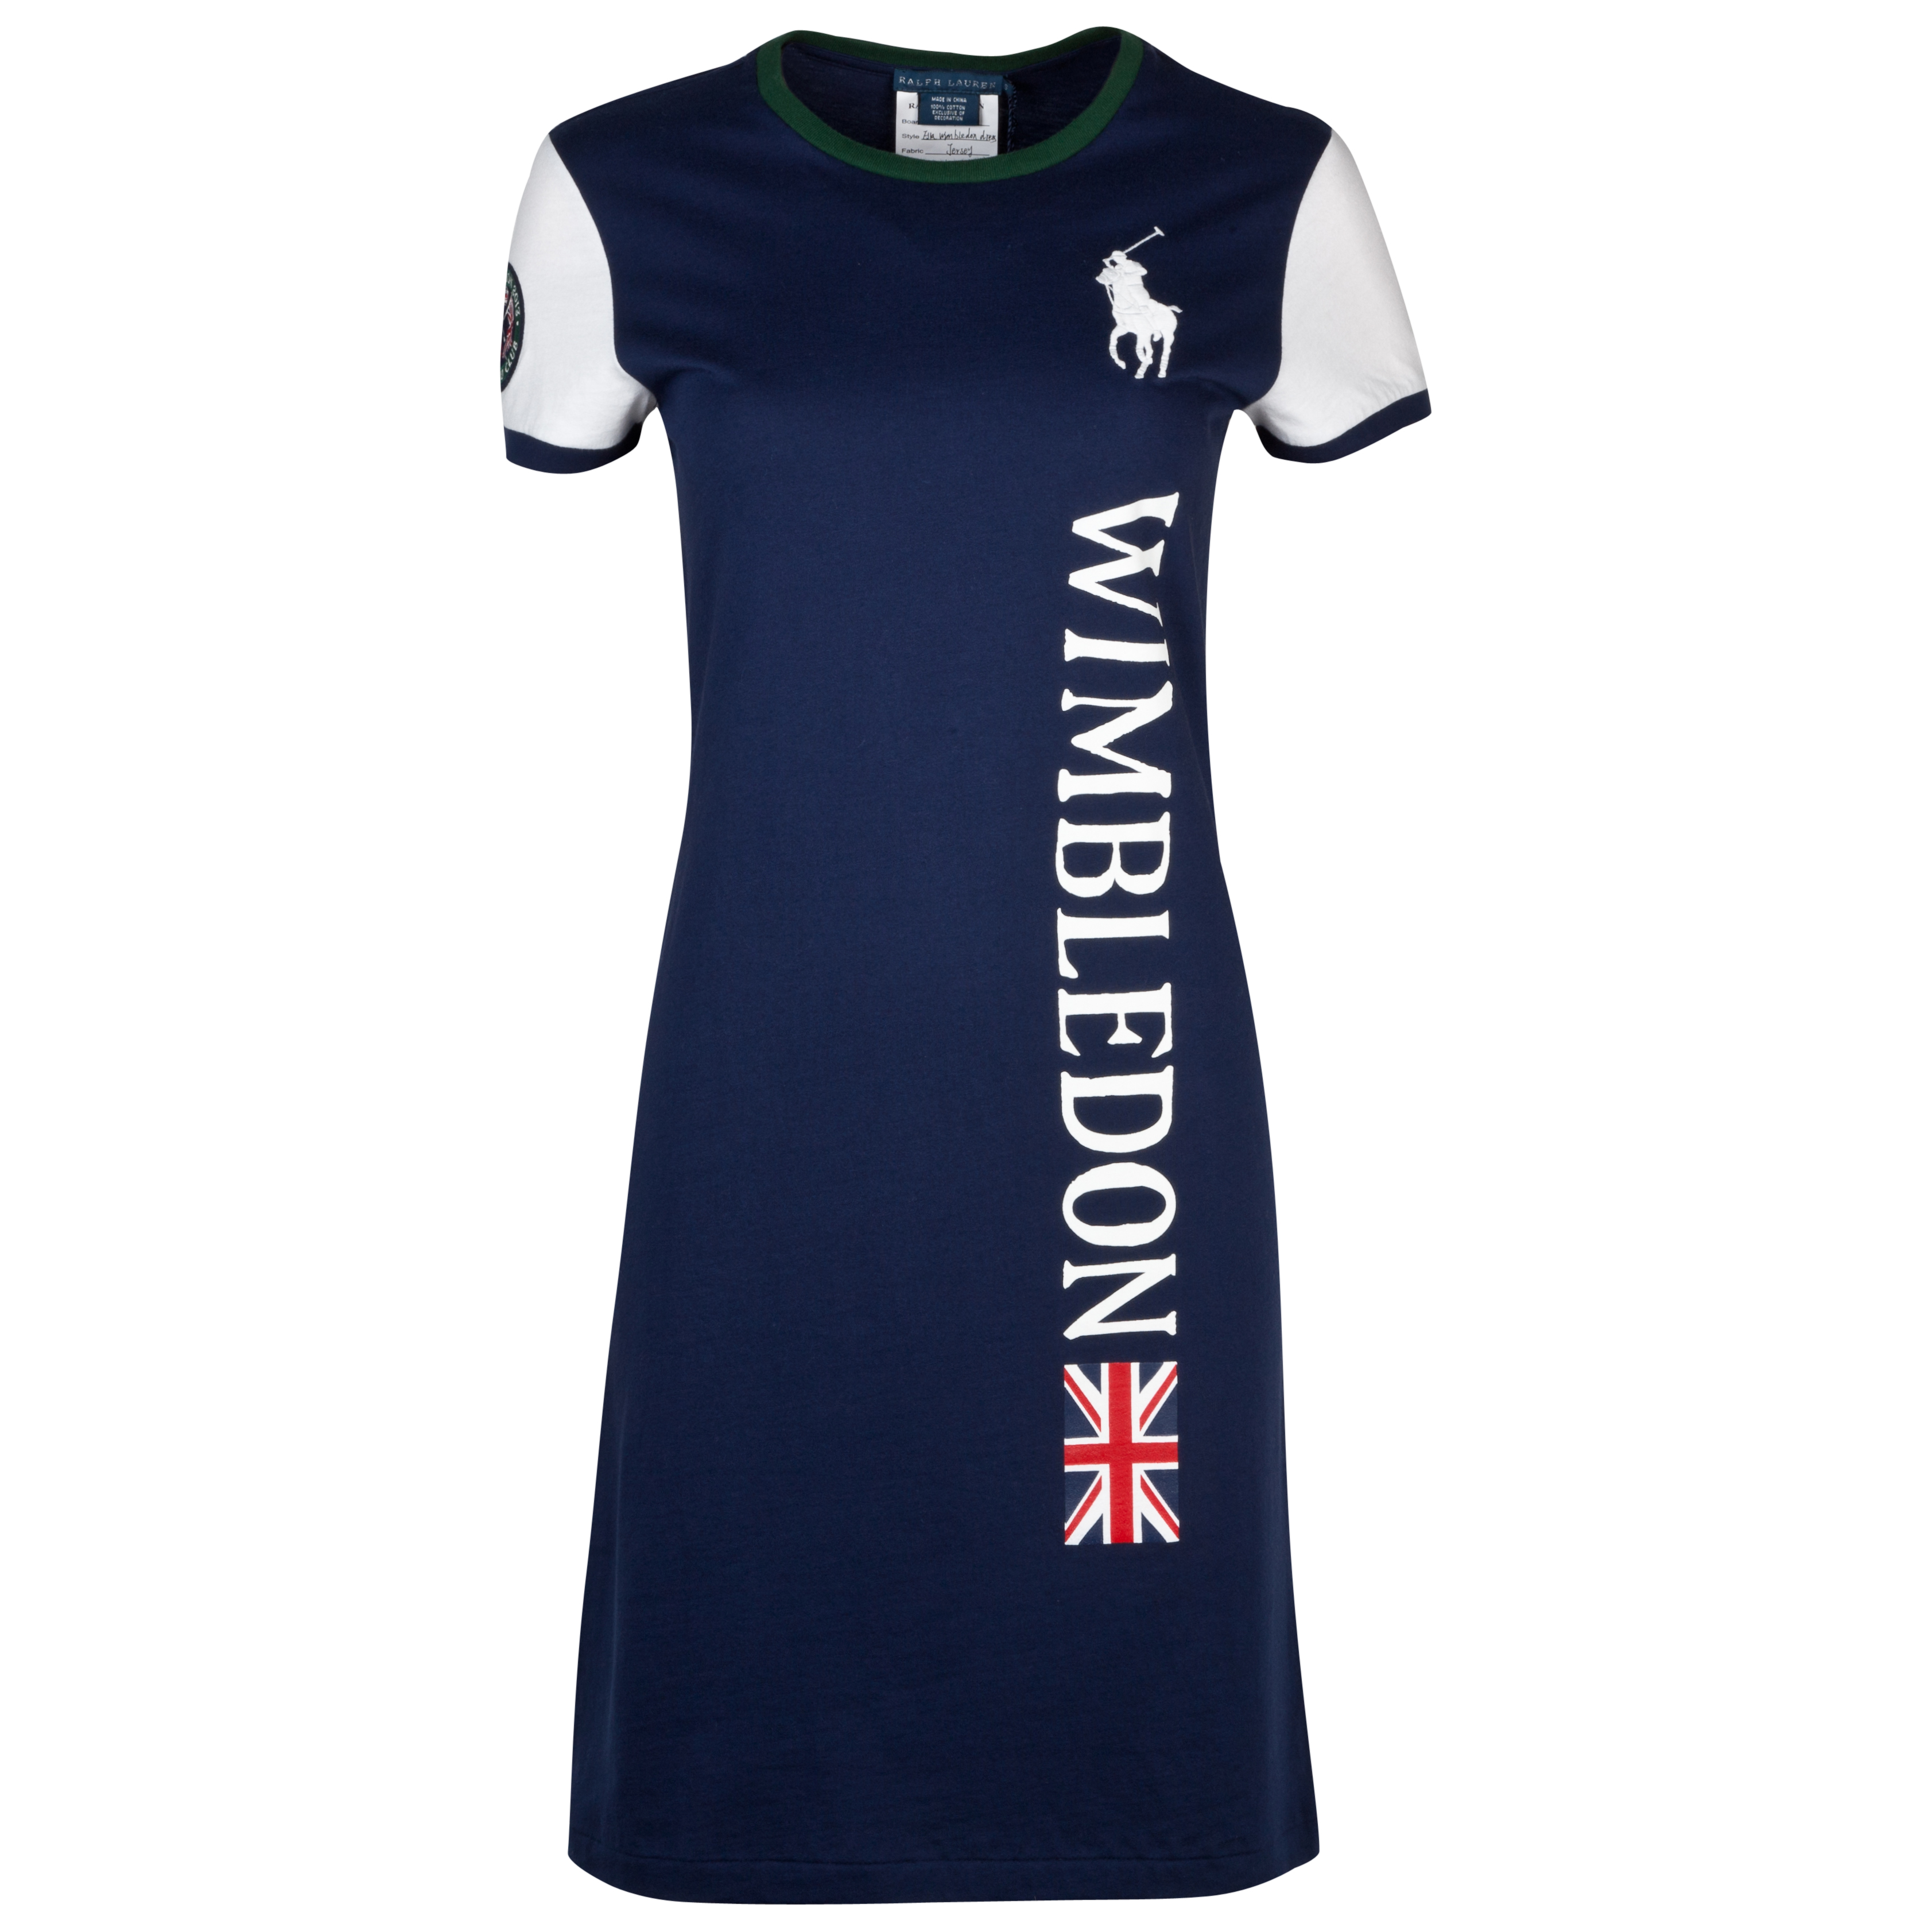 Polo Ralph Lauren Polo Ella Vertical T-Shirt Dress - French Navy - Womens